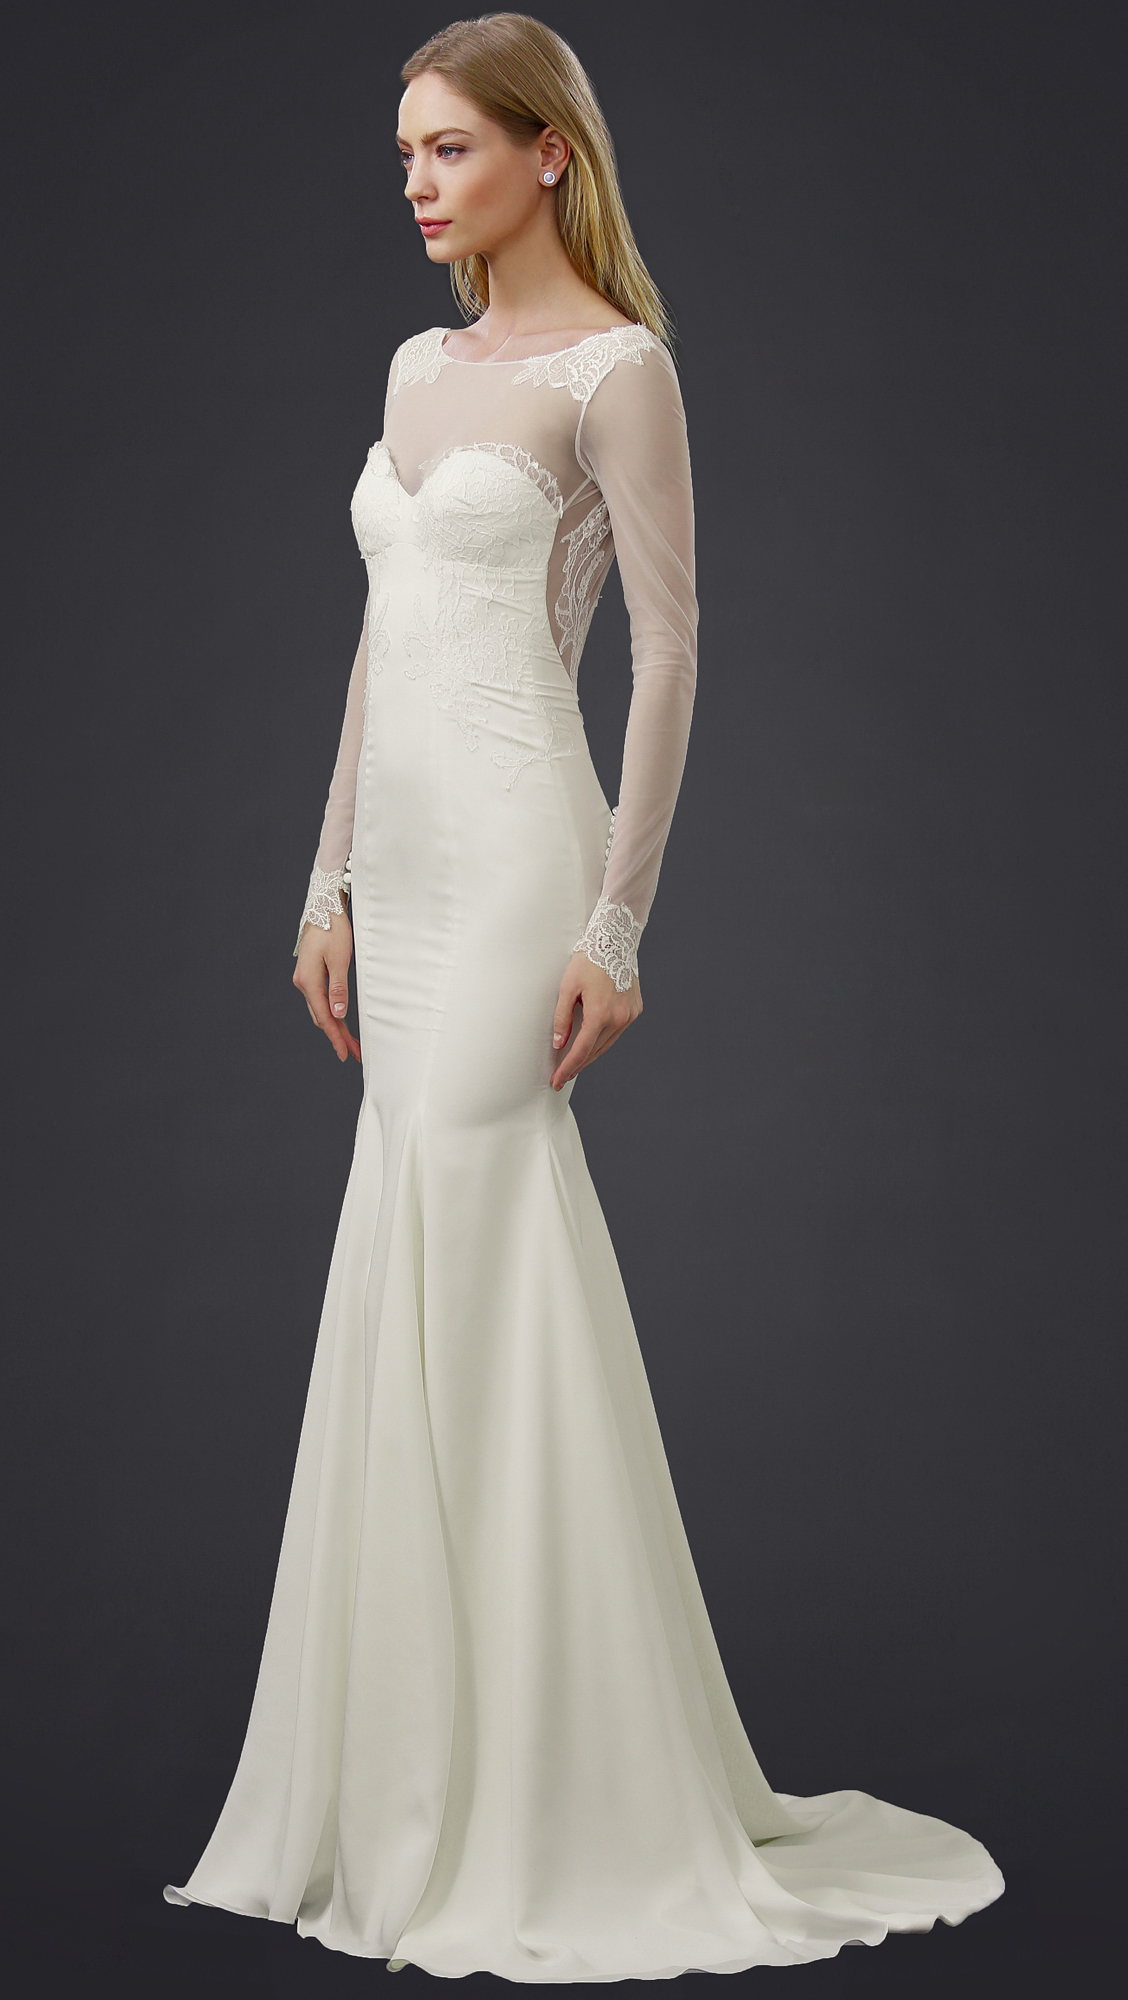 Katie May Verona Gown | SHOPBOP